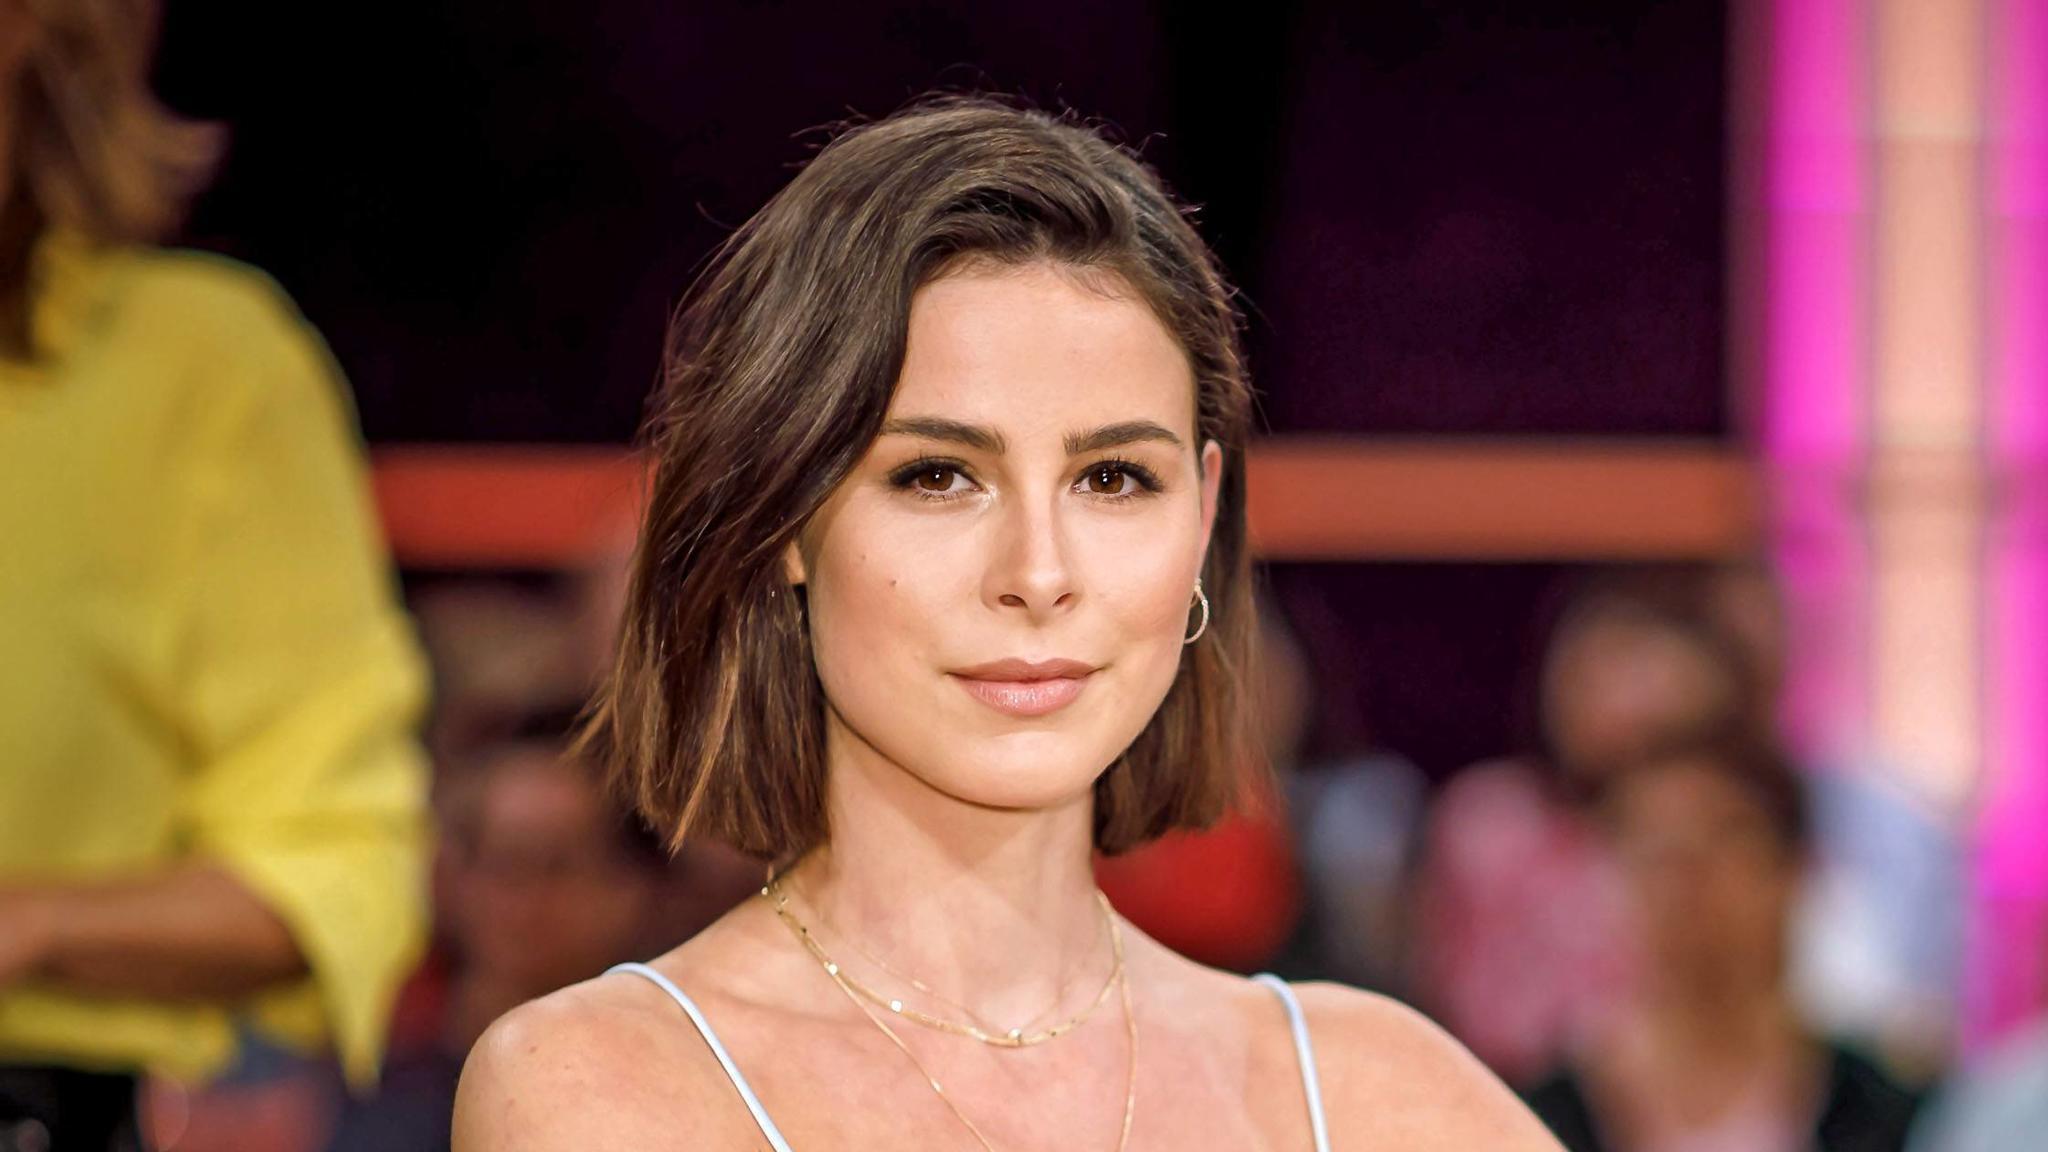 Lena Meyer-Landrut soll Mama geworden sein - RTL Online